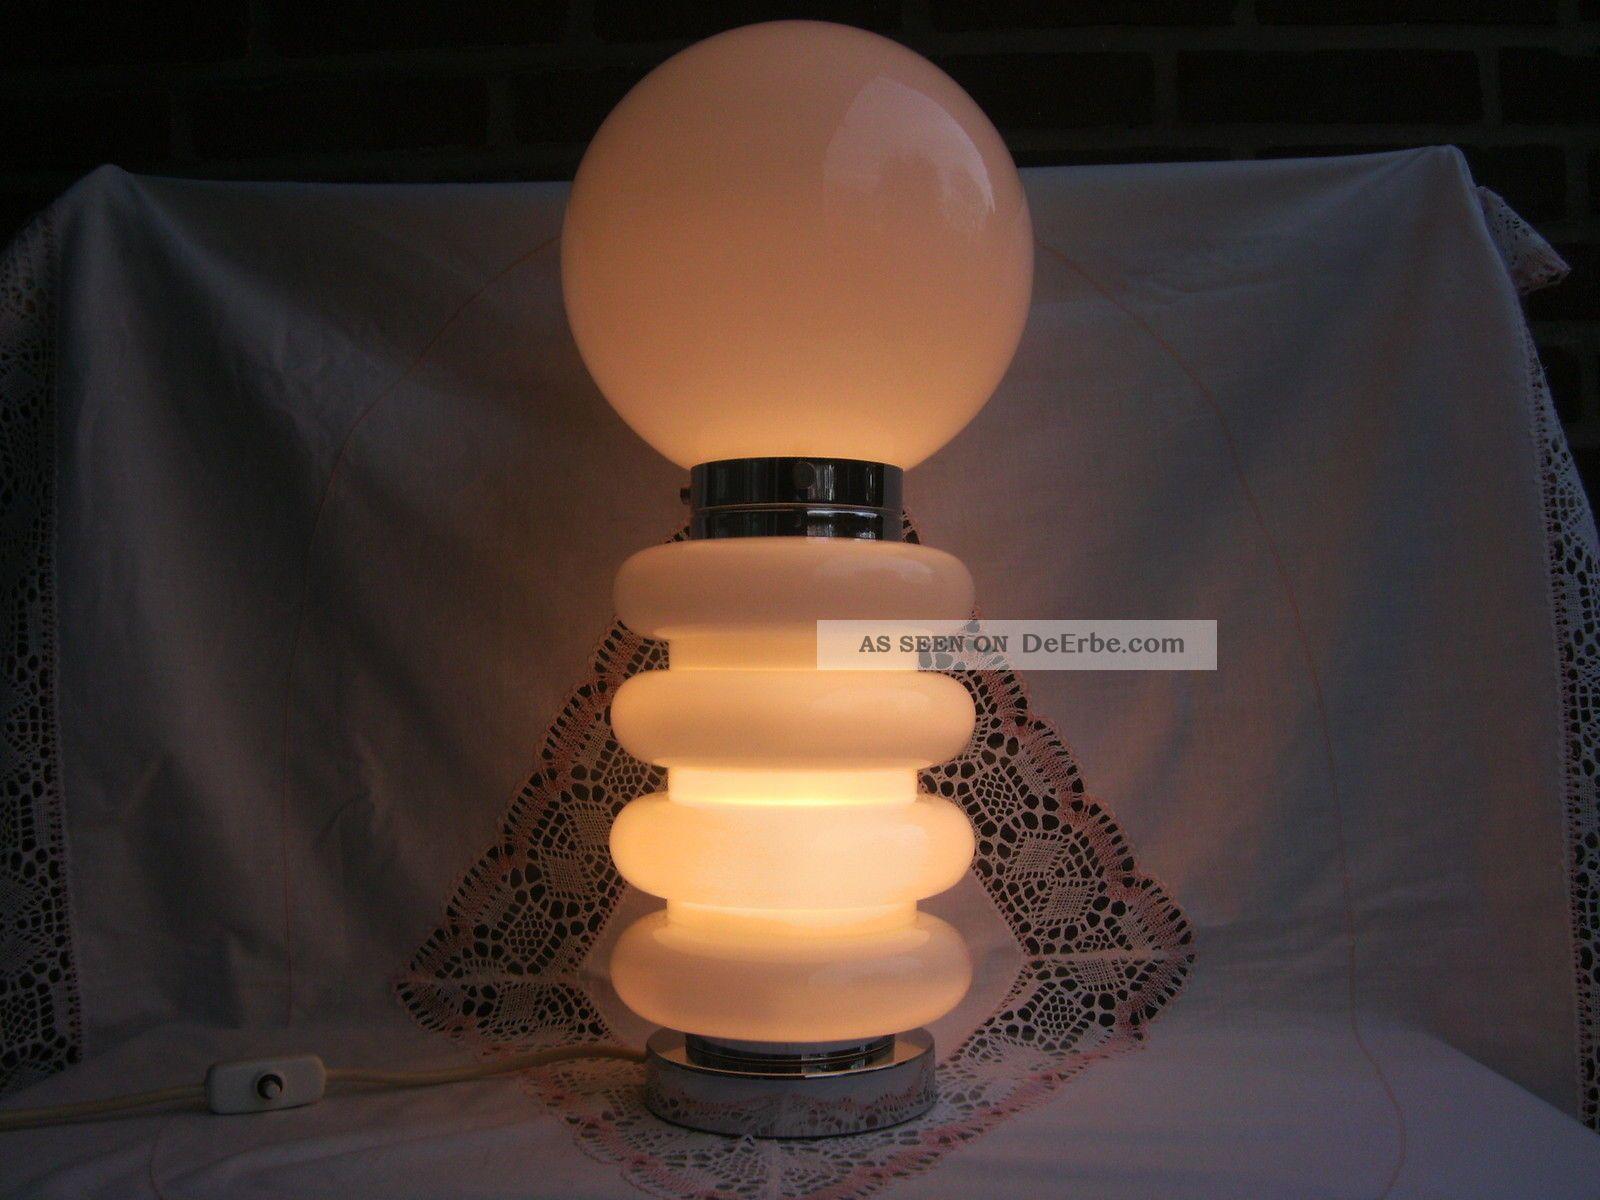 Jbs tischlampe tischleuchte bulb design glas chrom metall for Wohnzimmer 60er 70er